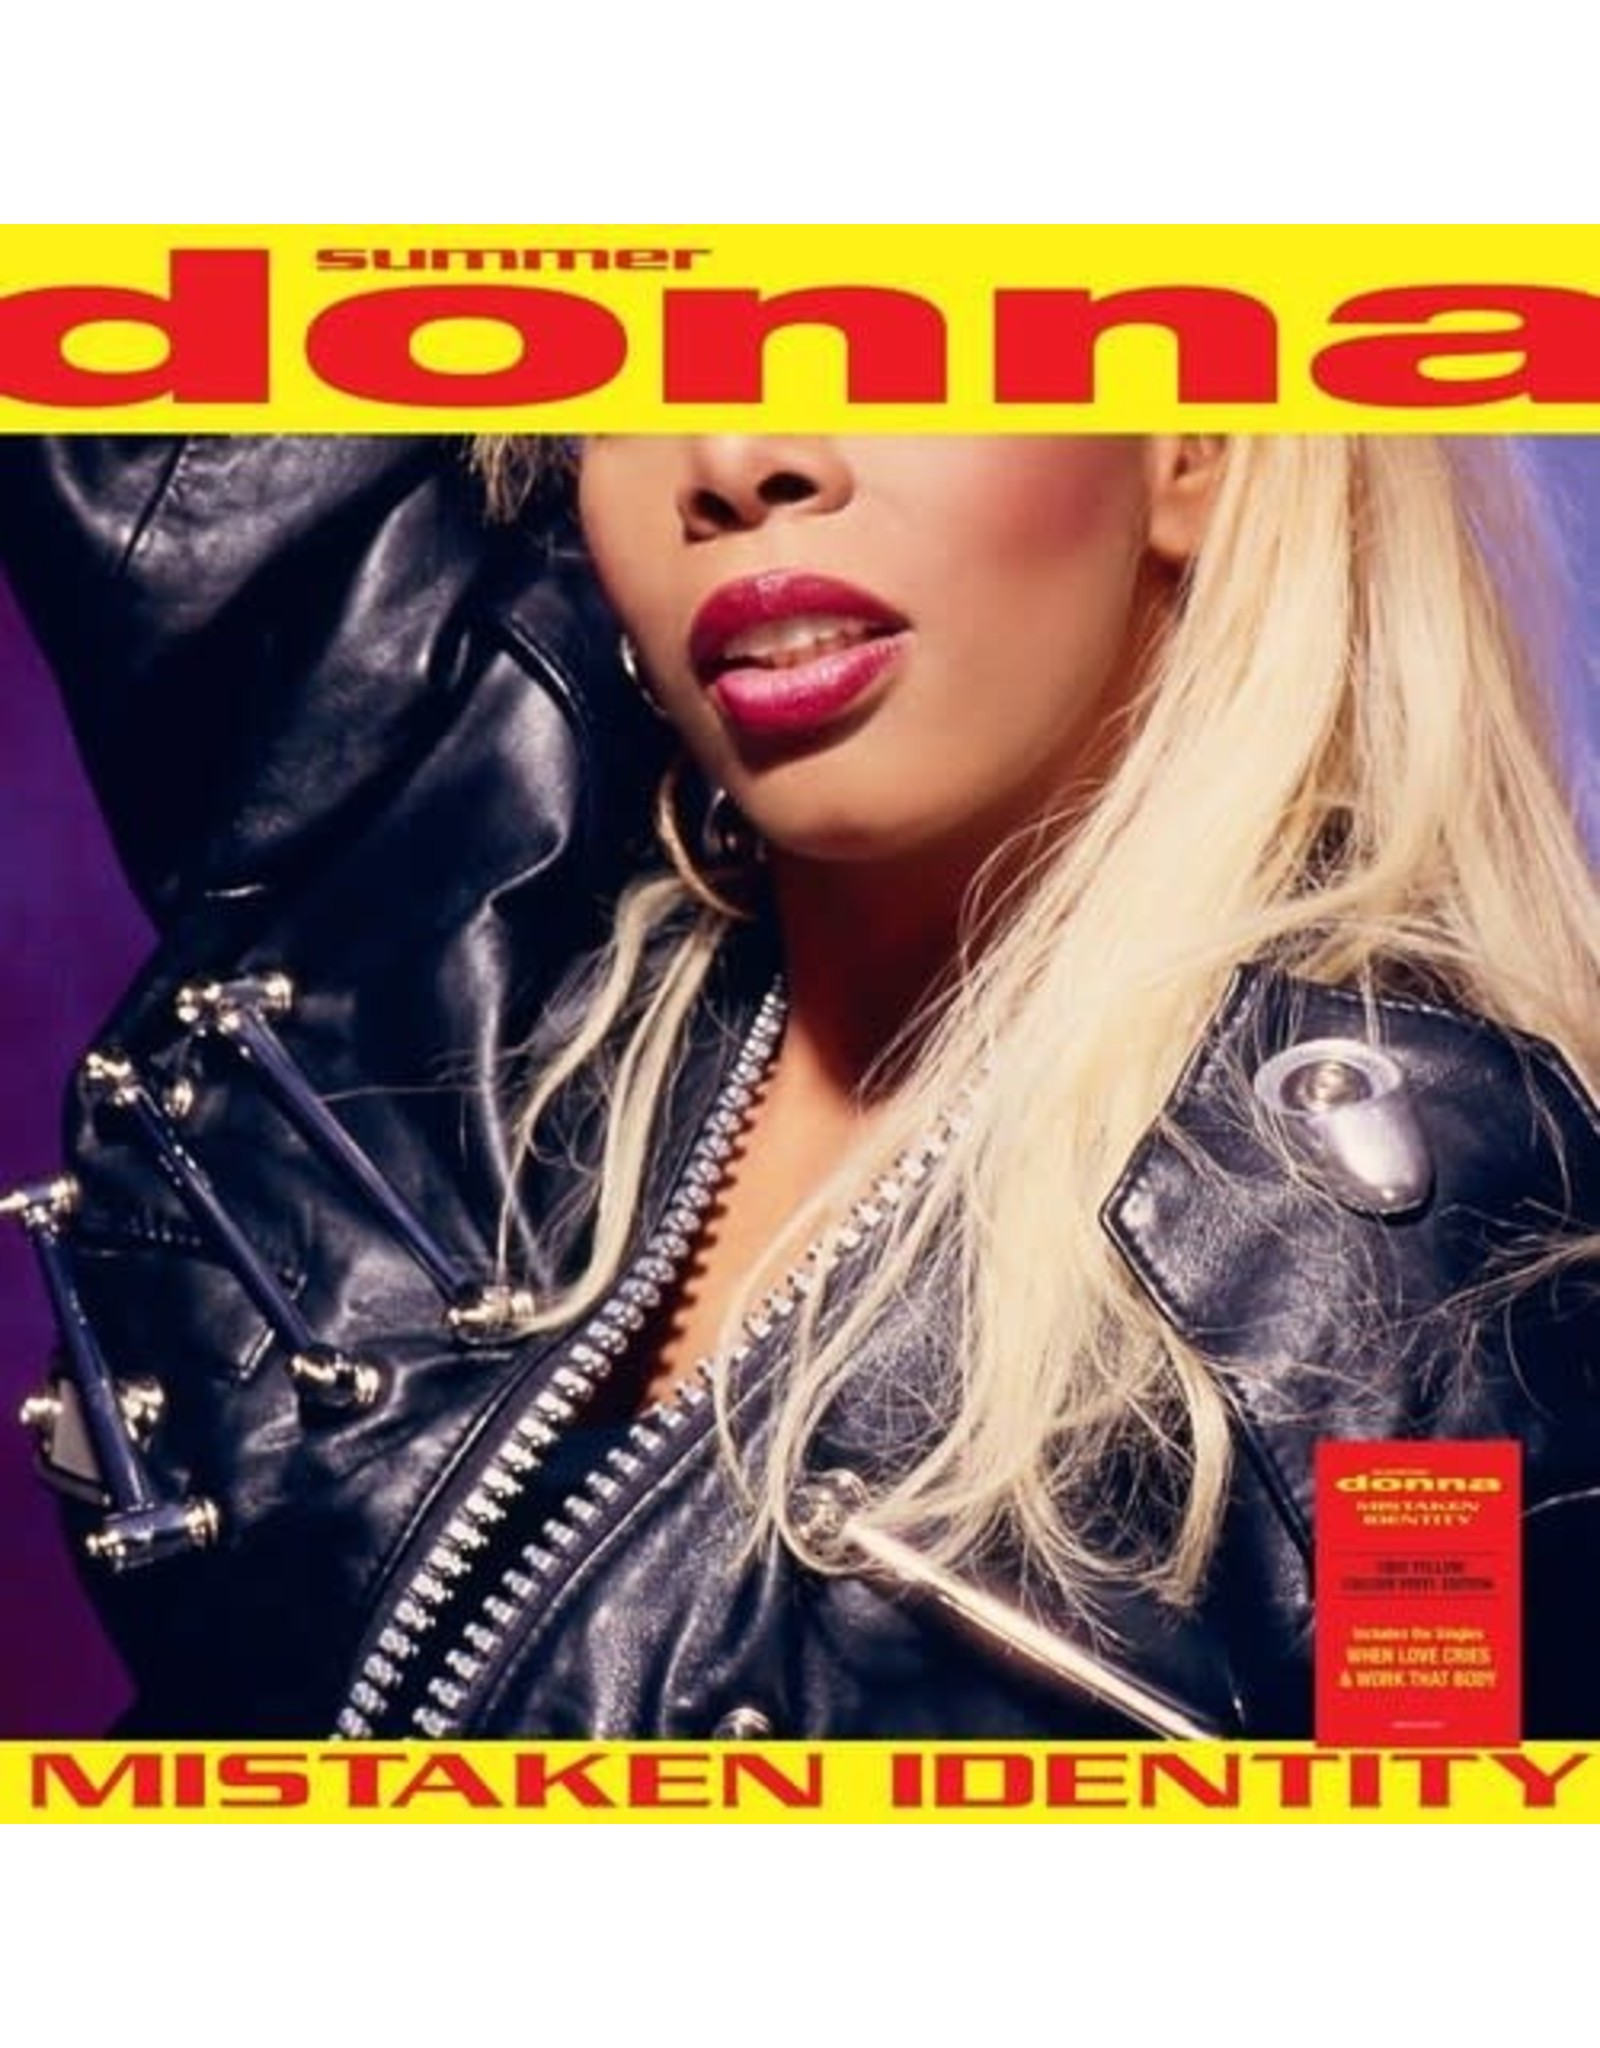 New Vinyl Donna Summer - Mistaken Identity [EU Import] (180g, Colored) LP